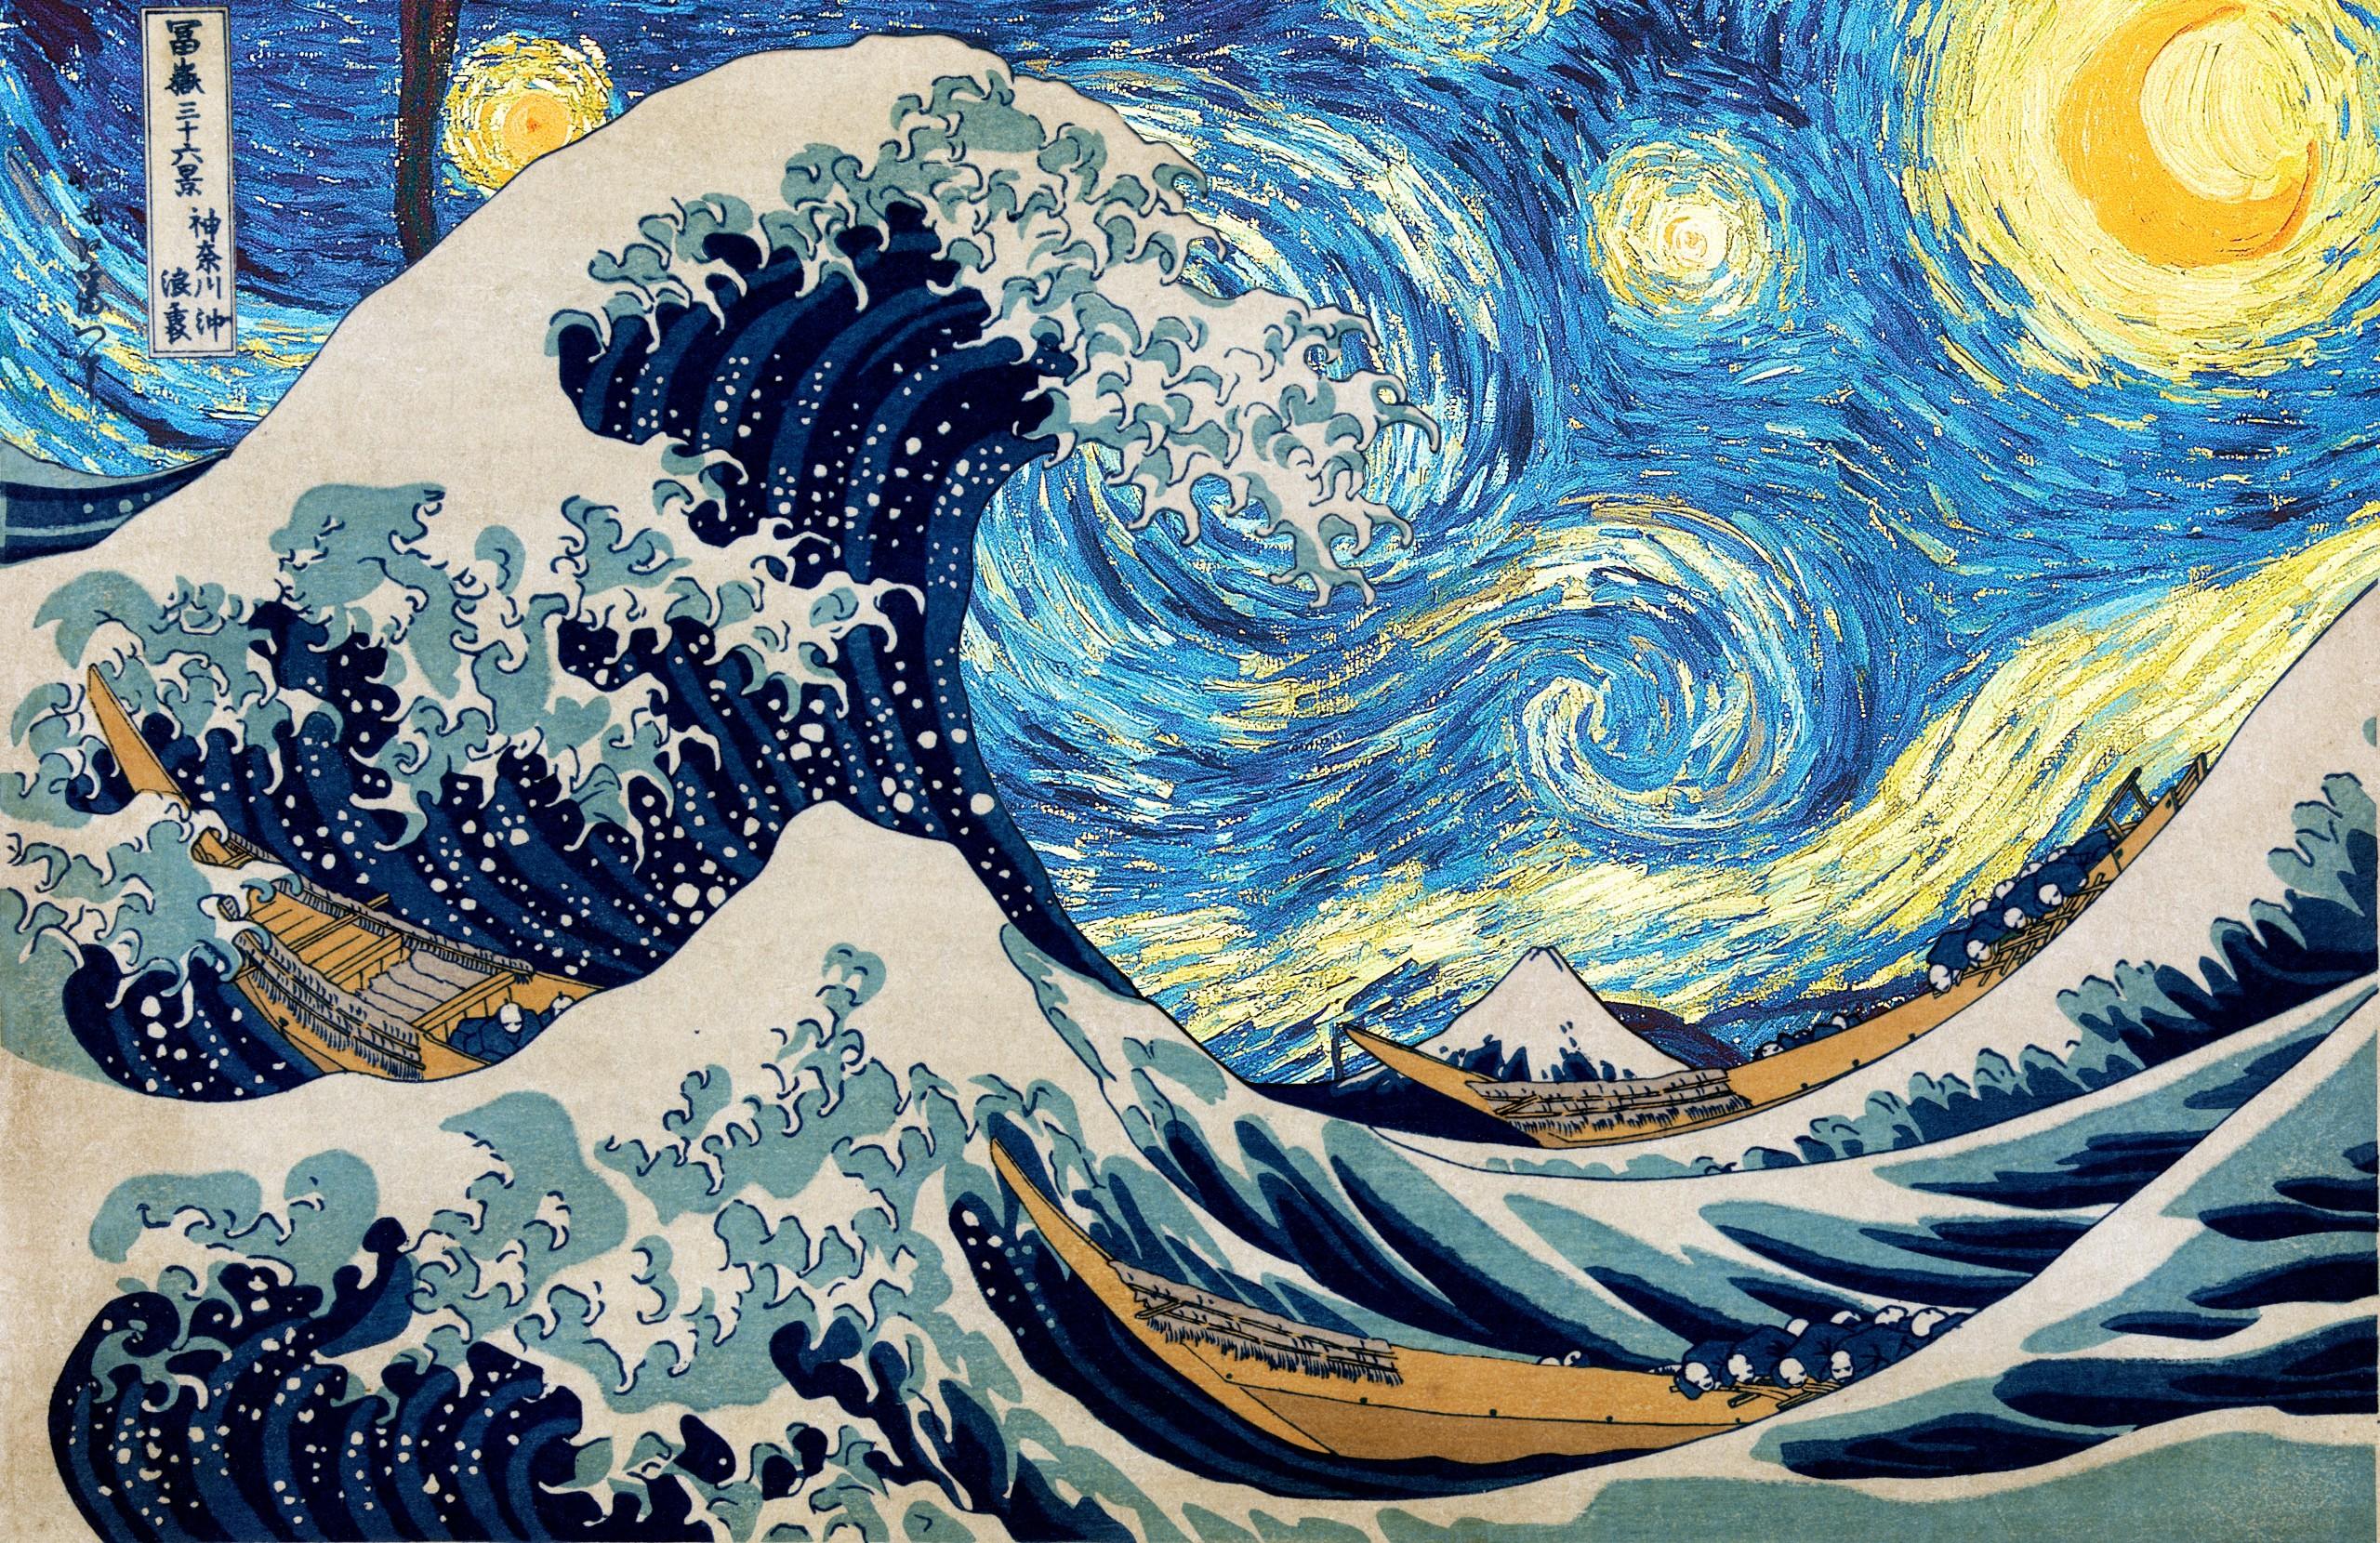 Sfondi La Pittura Illustrazione Notte Stellata Hokusai Vincent